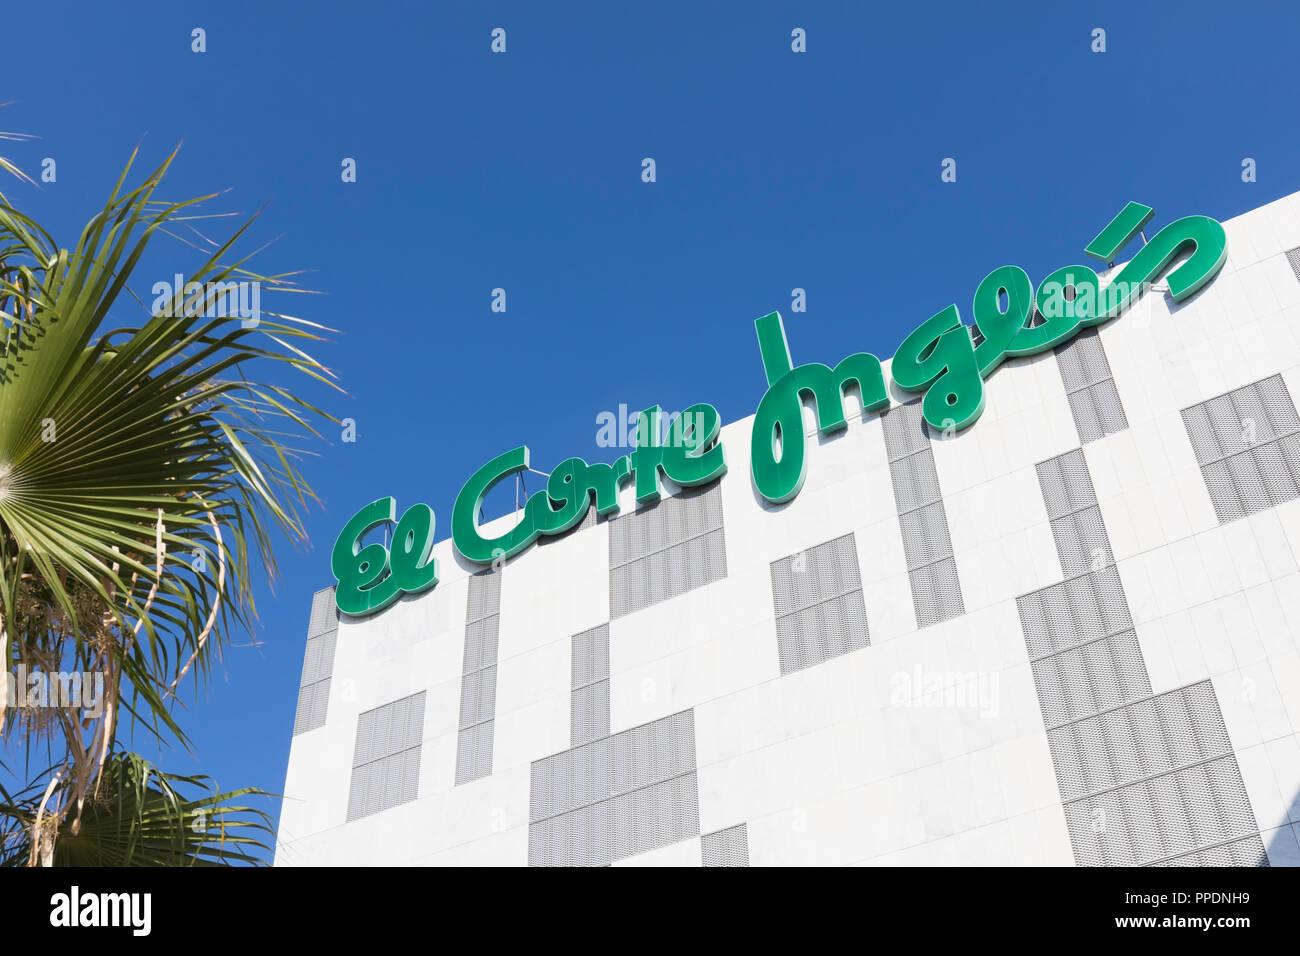 Fuengirola, Costa del Sol, Provinz Malaga, Andalusien, Südspanien. El Corte Ingles. Stockbild